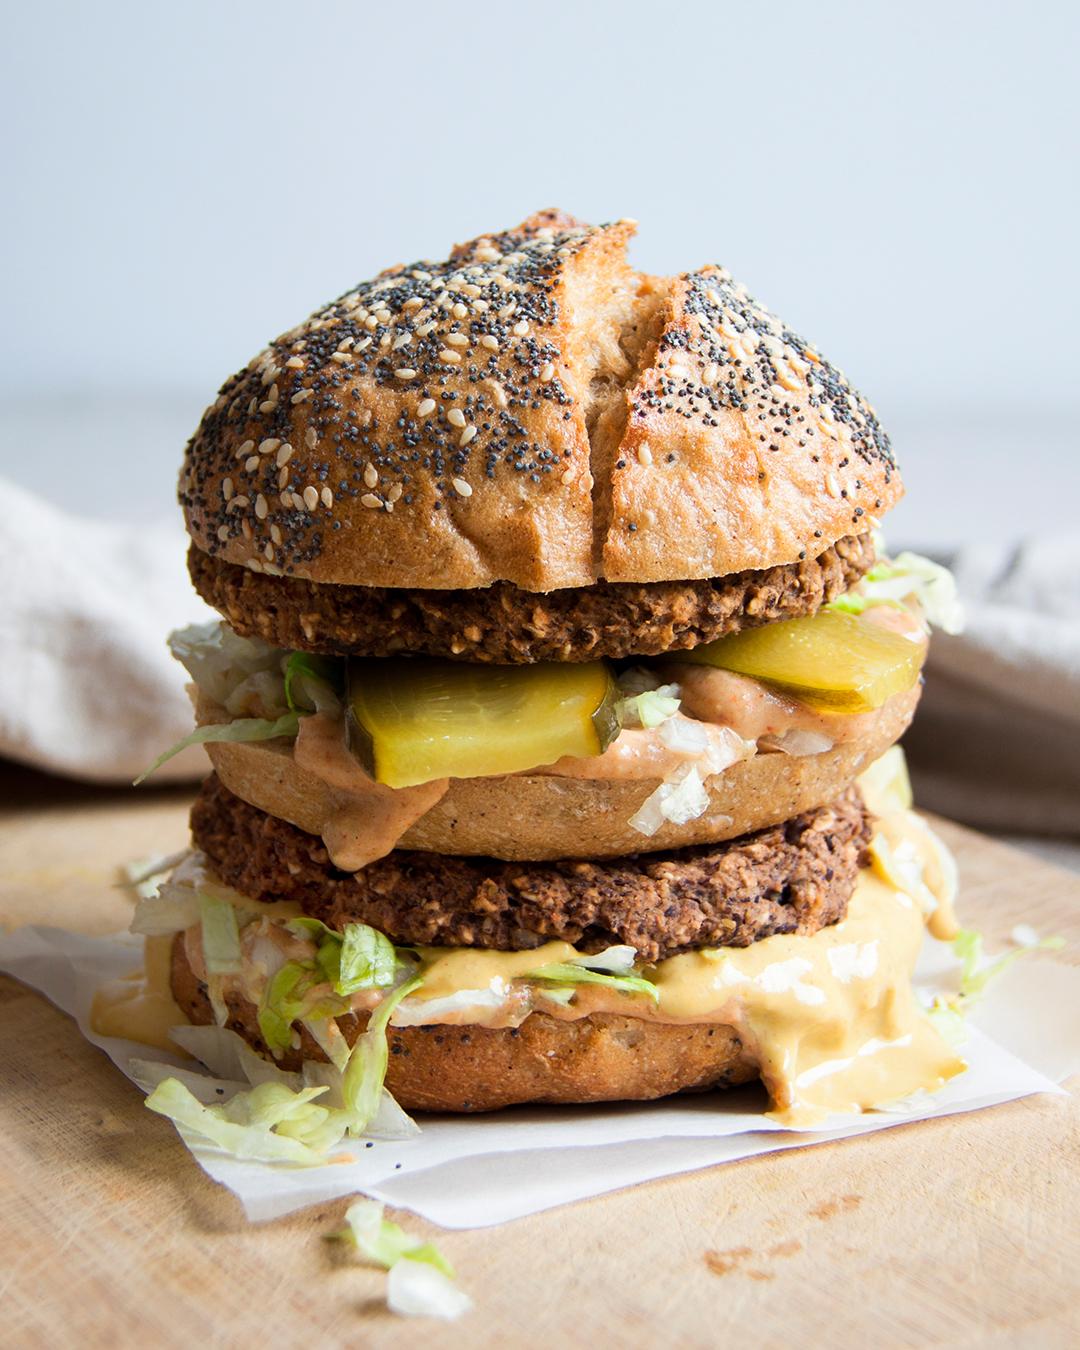 whole-food-plant-based-big-mac-vegan-whole-foods-olievrij-suikervrij-02b.jpg